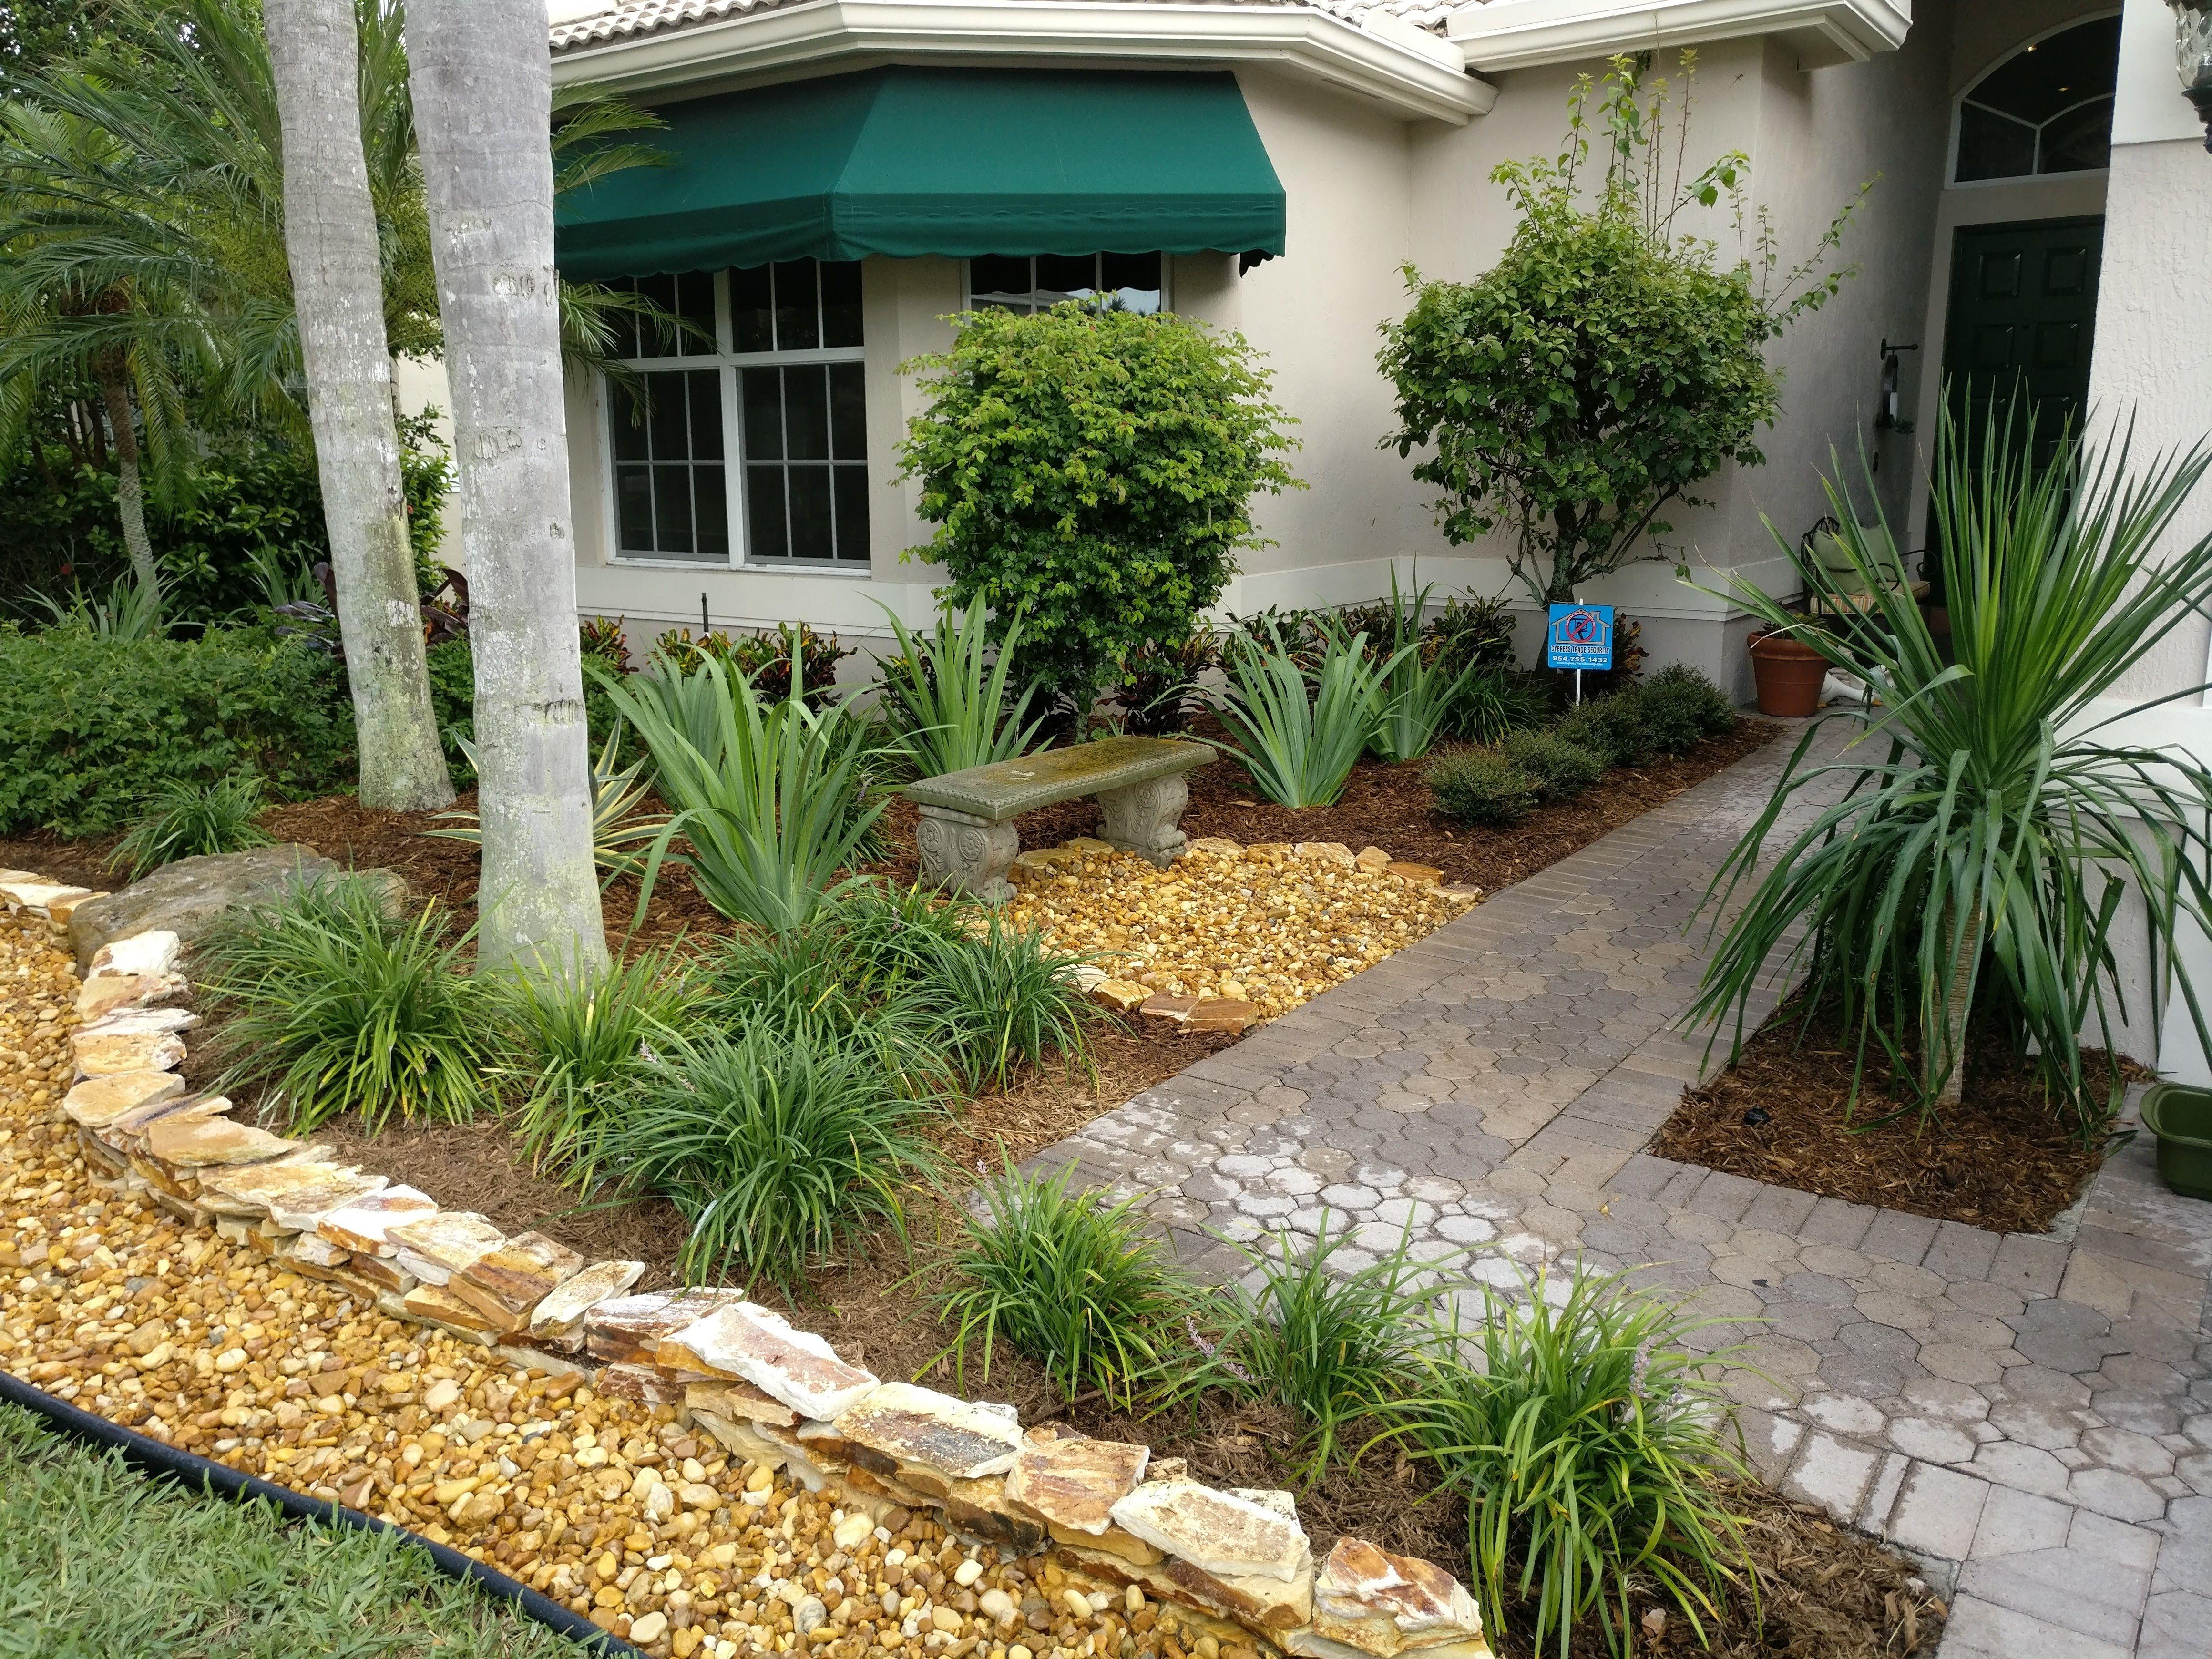 Landscape refurbishment using stones and tropicals.